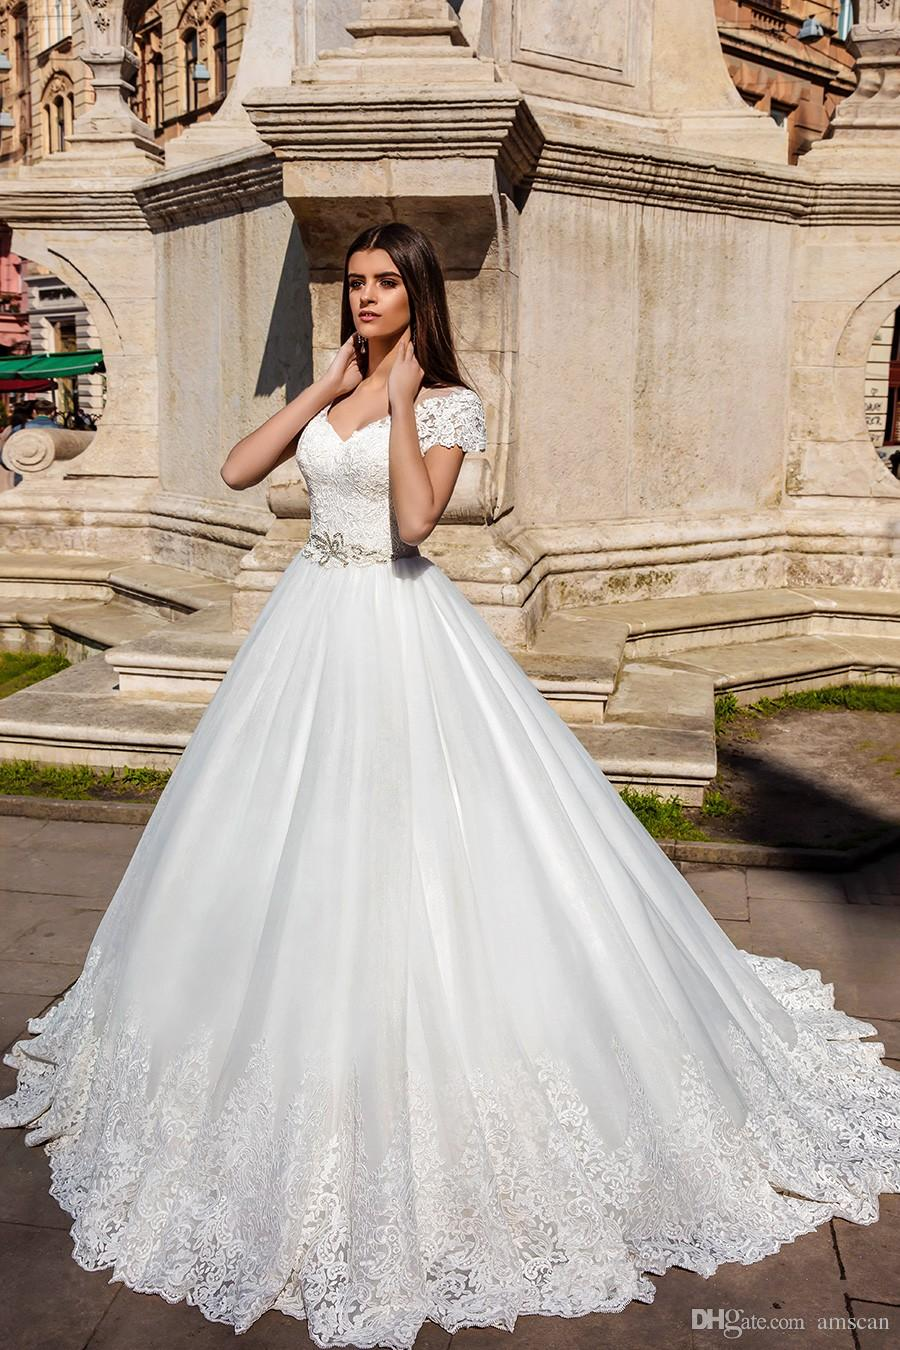 discount 2019 appliques lace a line wedding dresses elegant v neck tulle  bridal gowns short sleeve beading sash cheap wedding dress vestidos de  novia